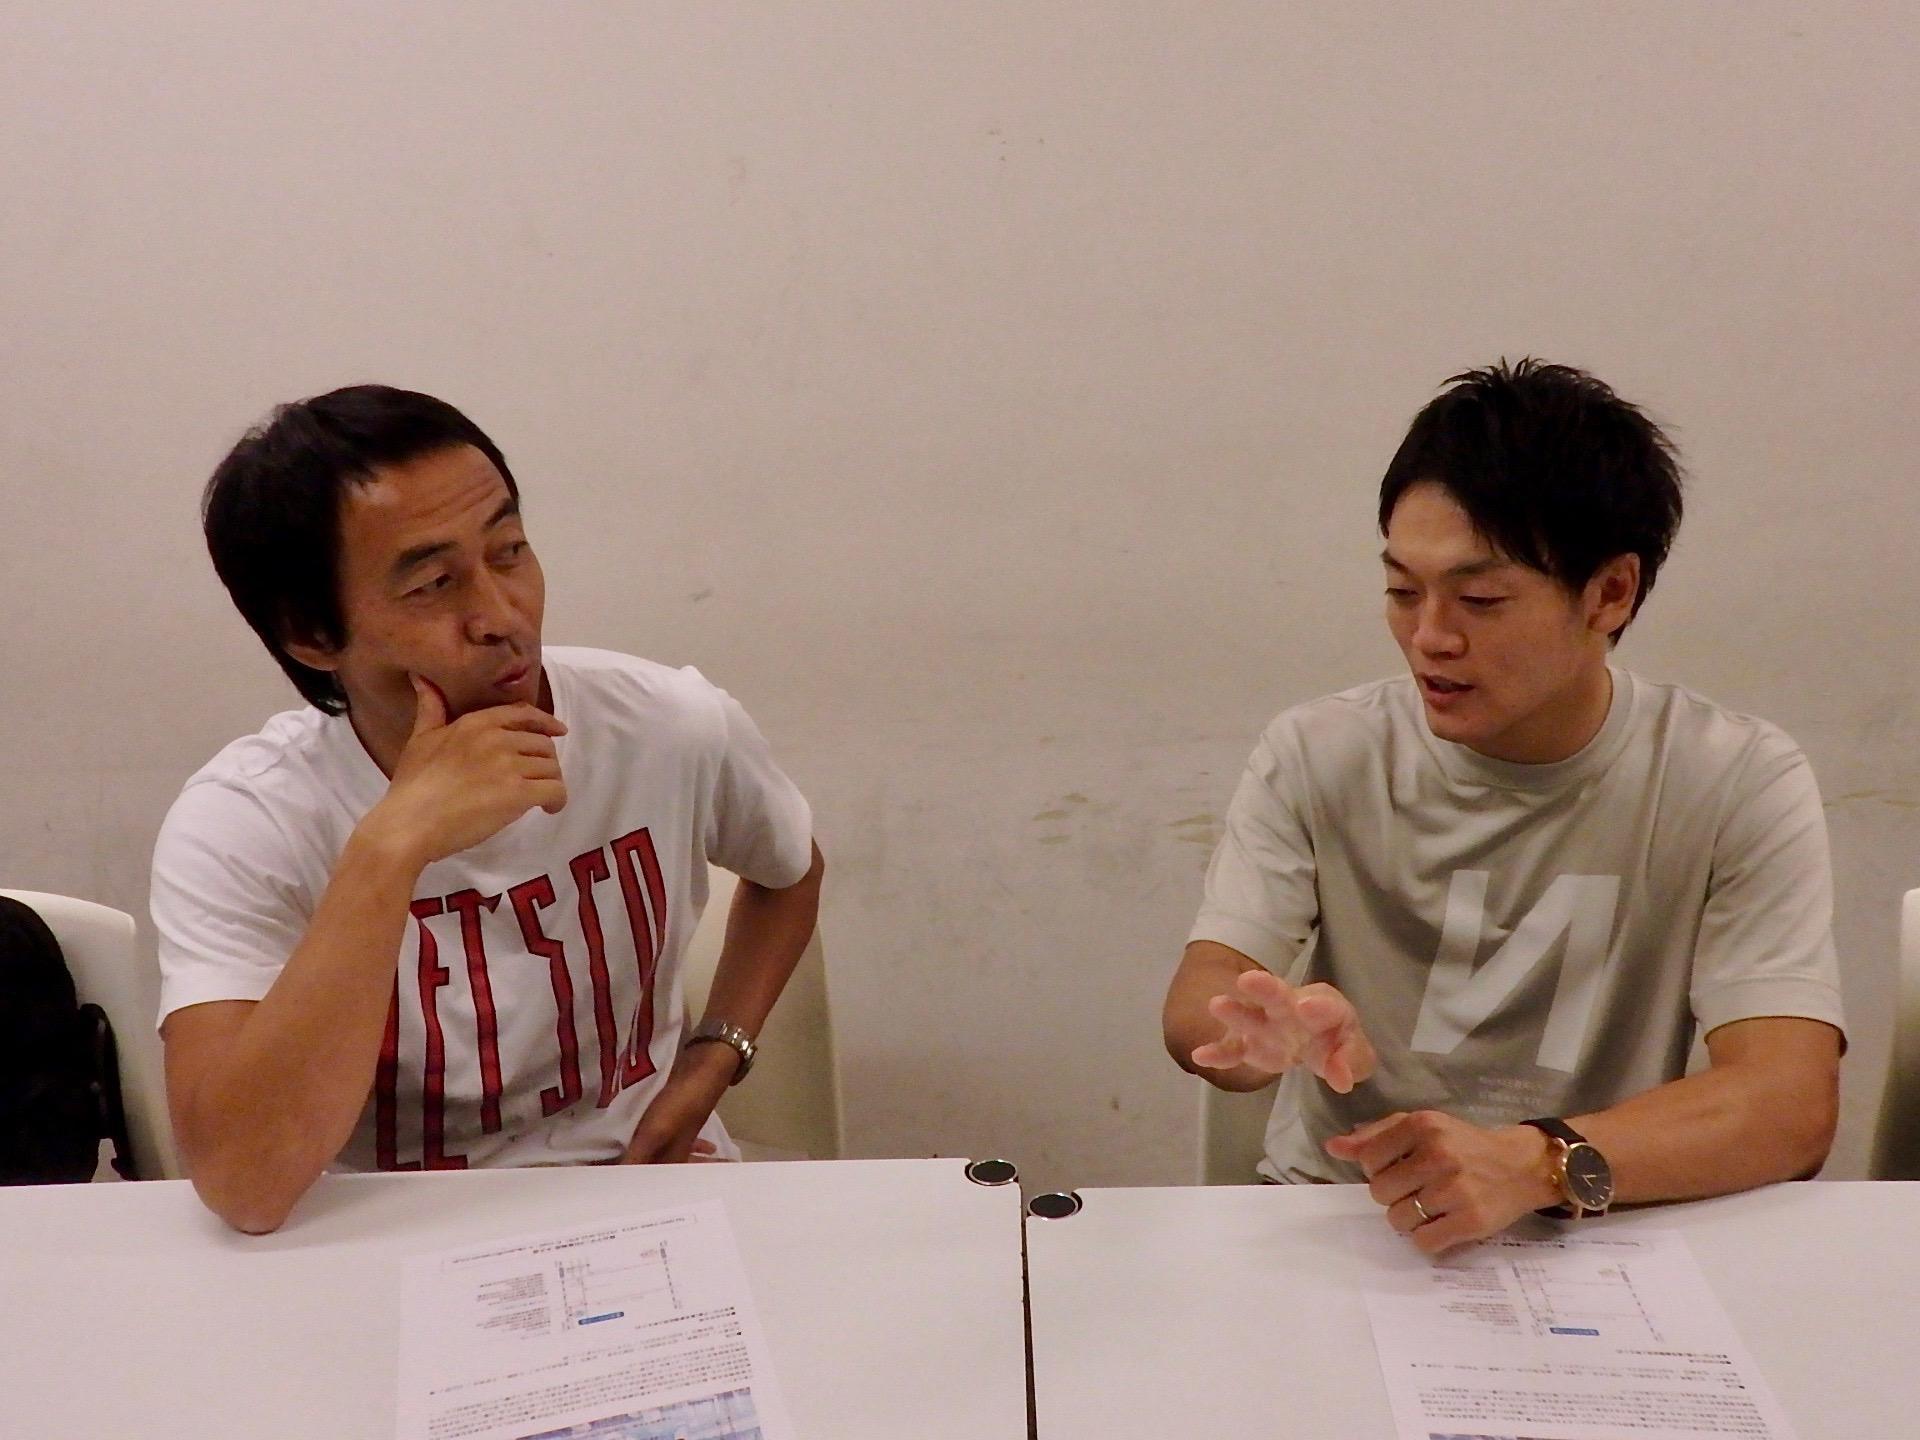 http://news.yoshimoto.co.jp/20180910044725-eaecbf5fc26a29c7fe3170f65585d7f1ddeccfad.jpg